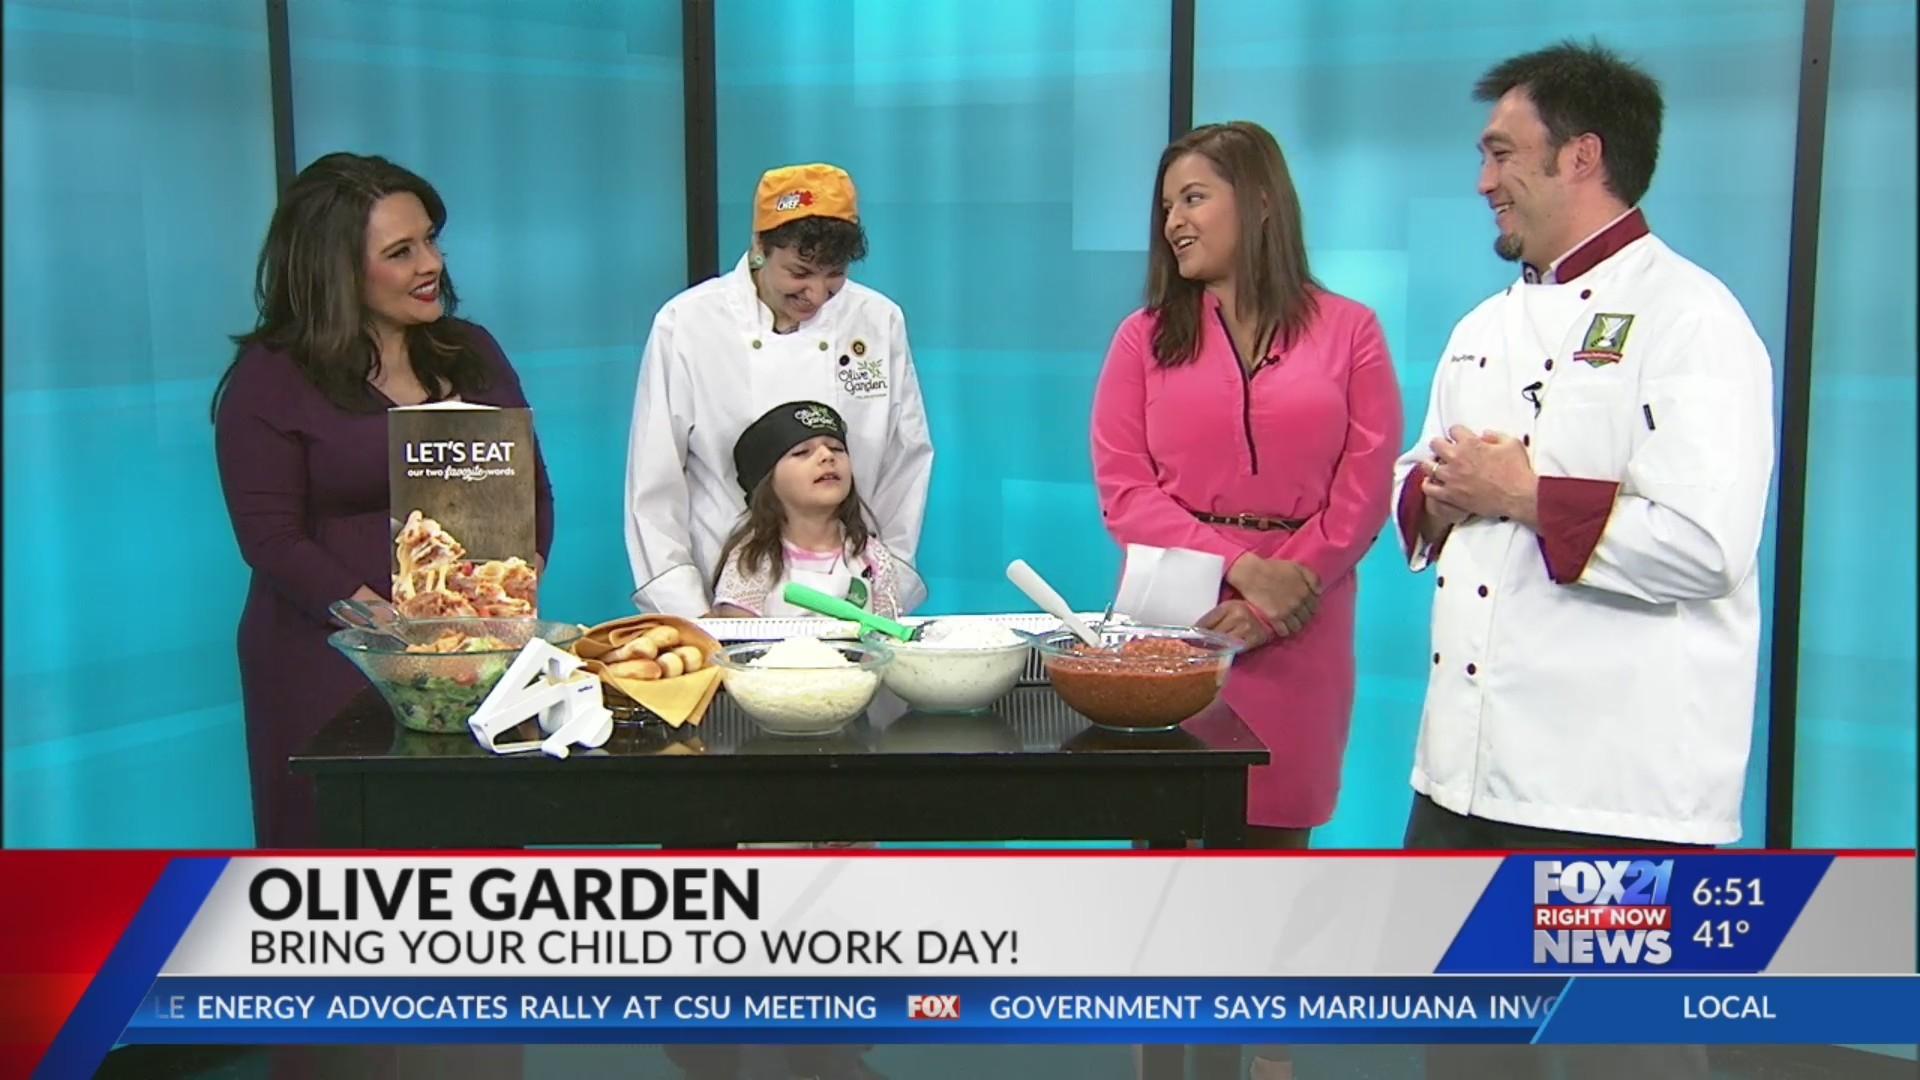 Olive Garden on FOX21 Morning News Part 1